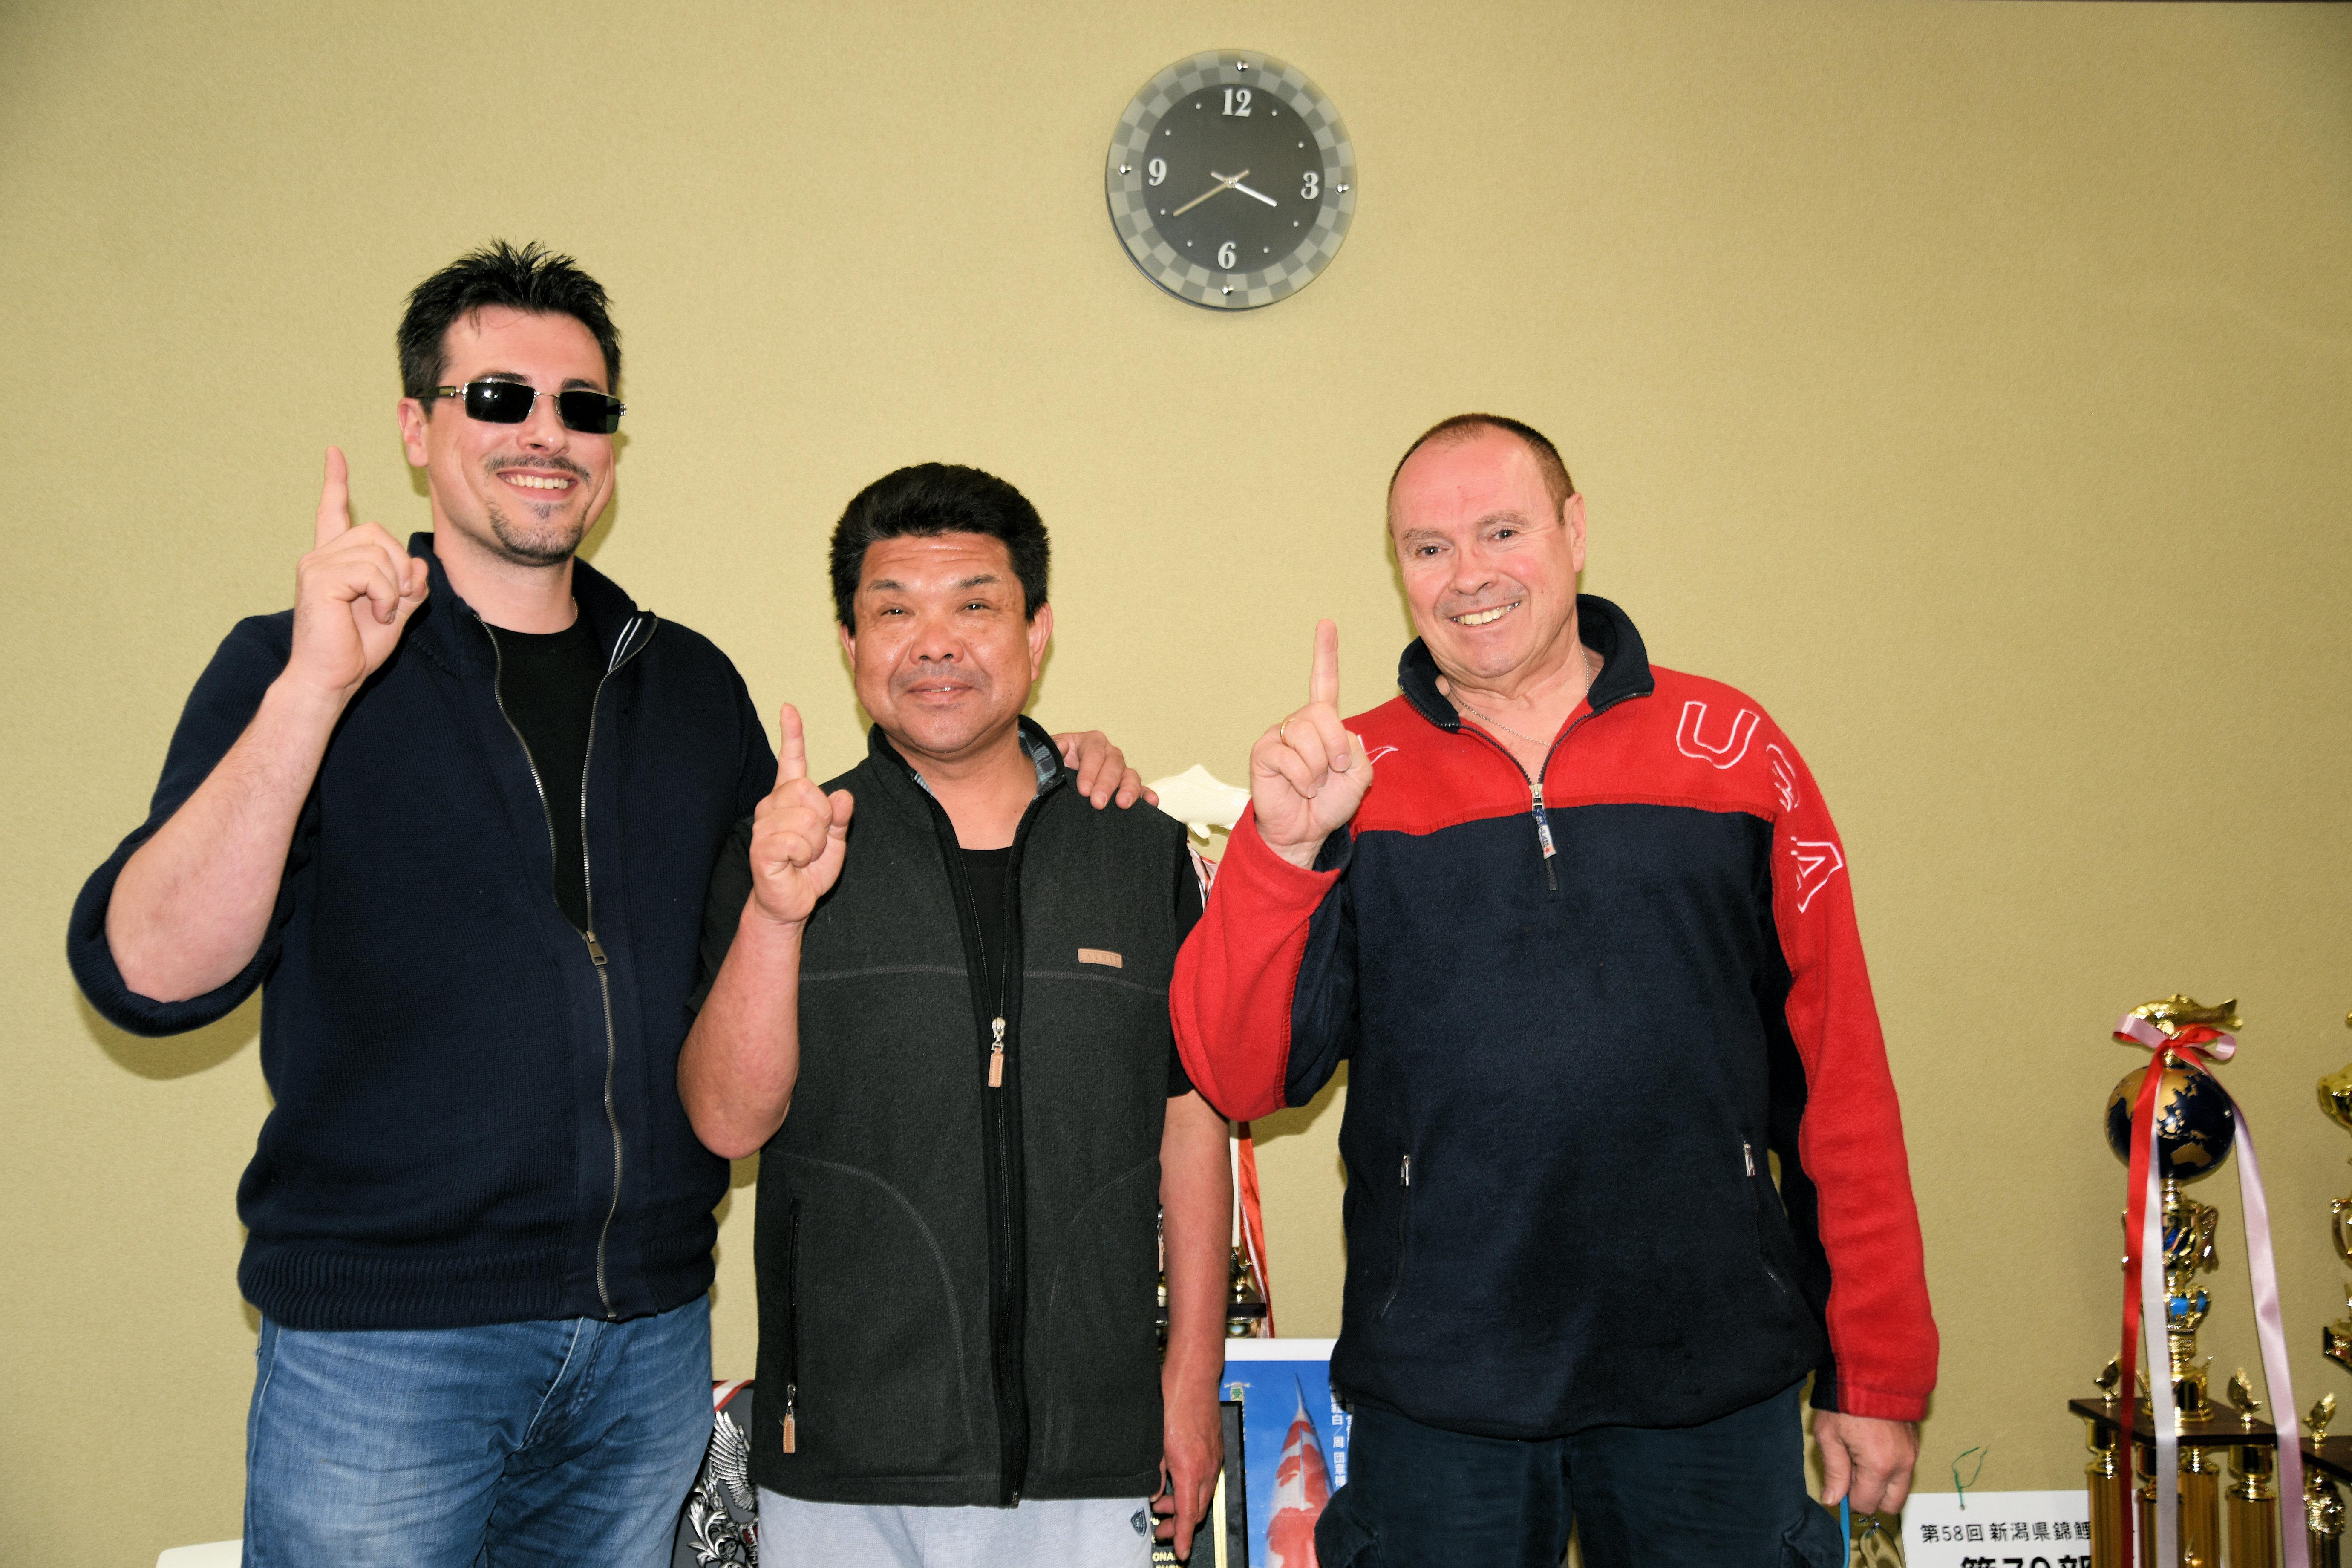 With Shinji Murata